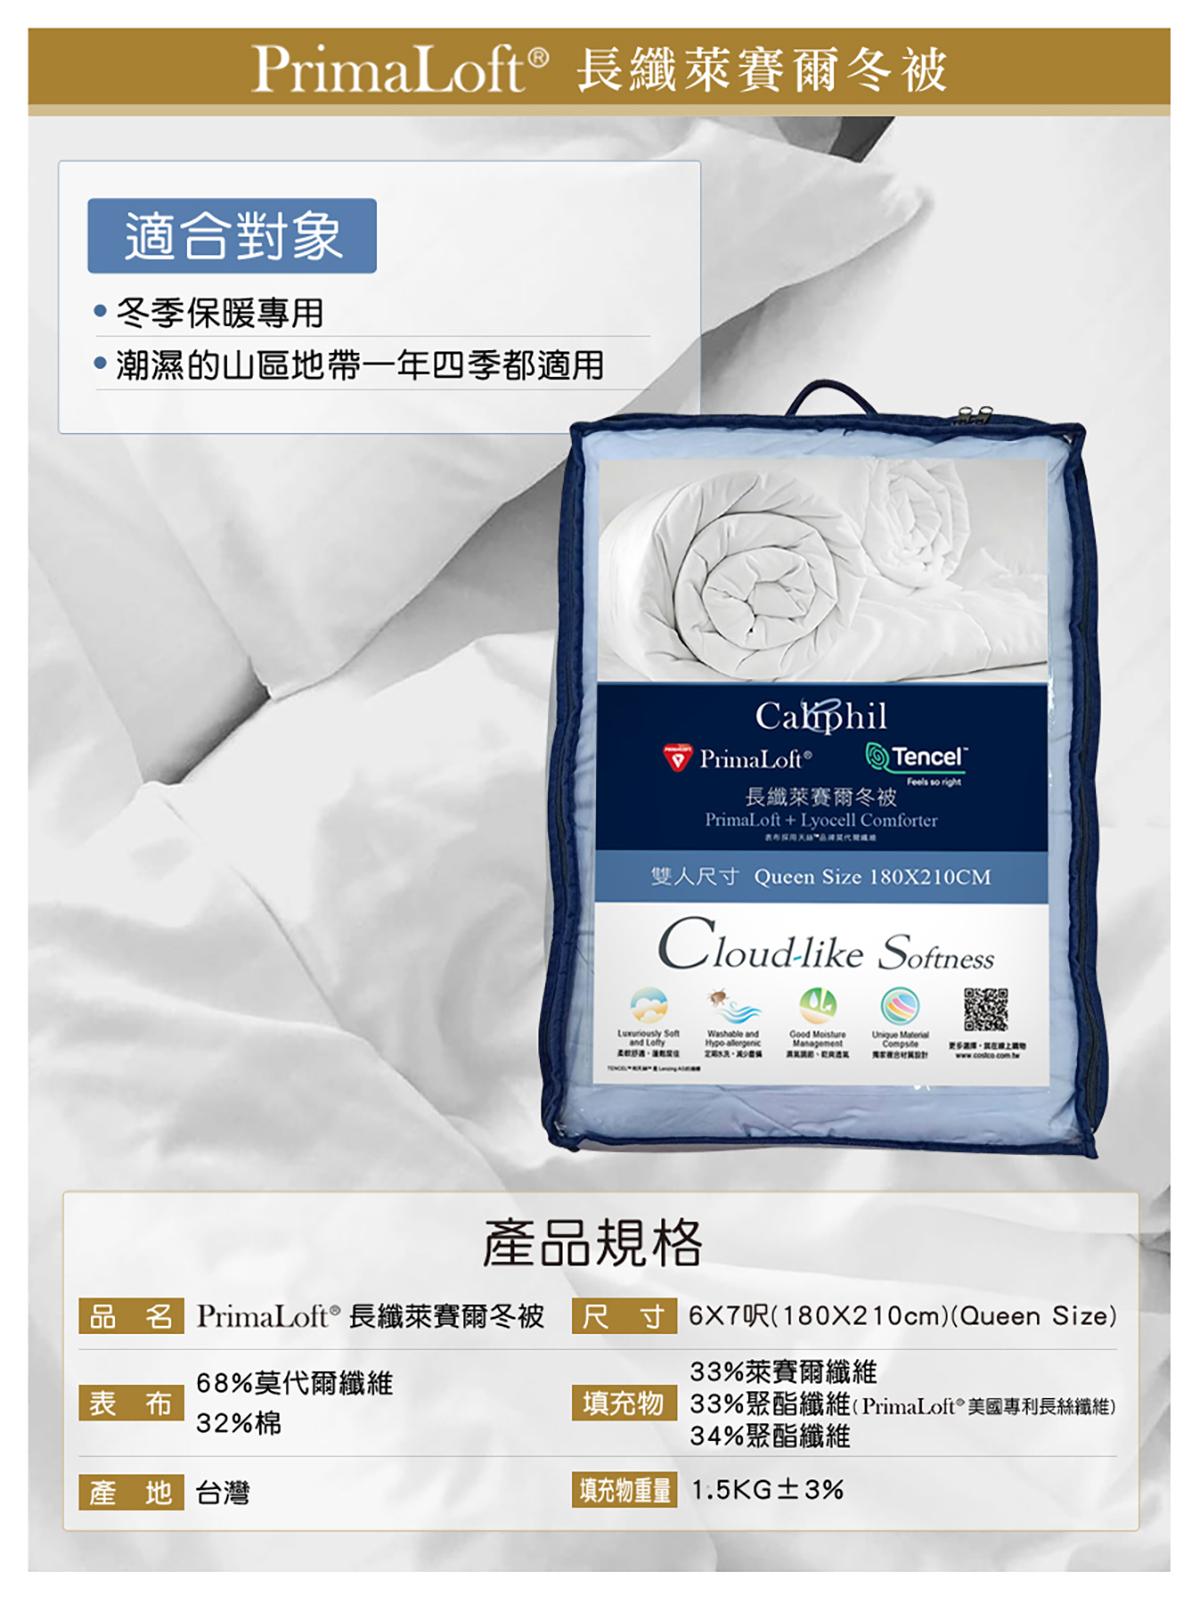 Caliphil PrimaLoft®+Lyocell 雙人長纖萊賽爾冬被 180X210公分- 藍色 | Costco 好市多線上購物